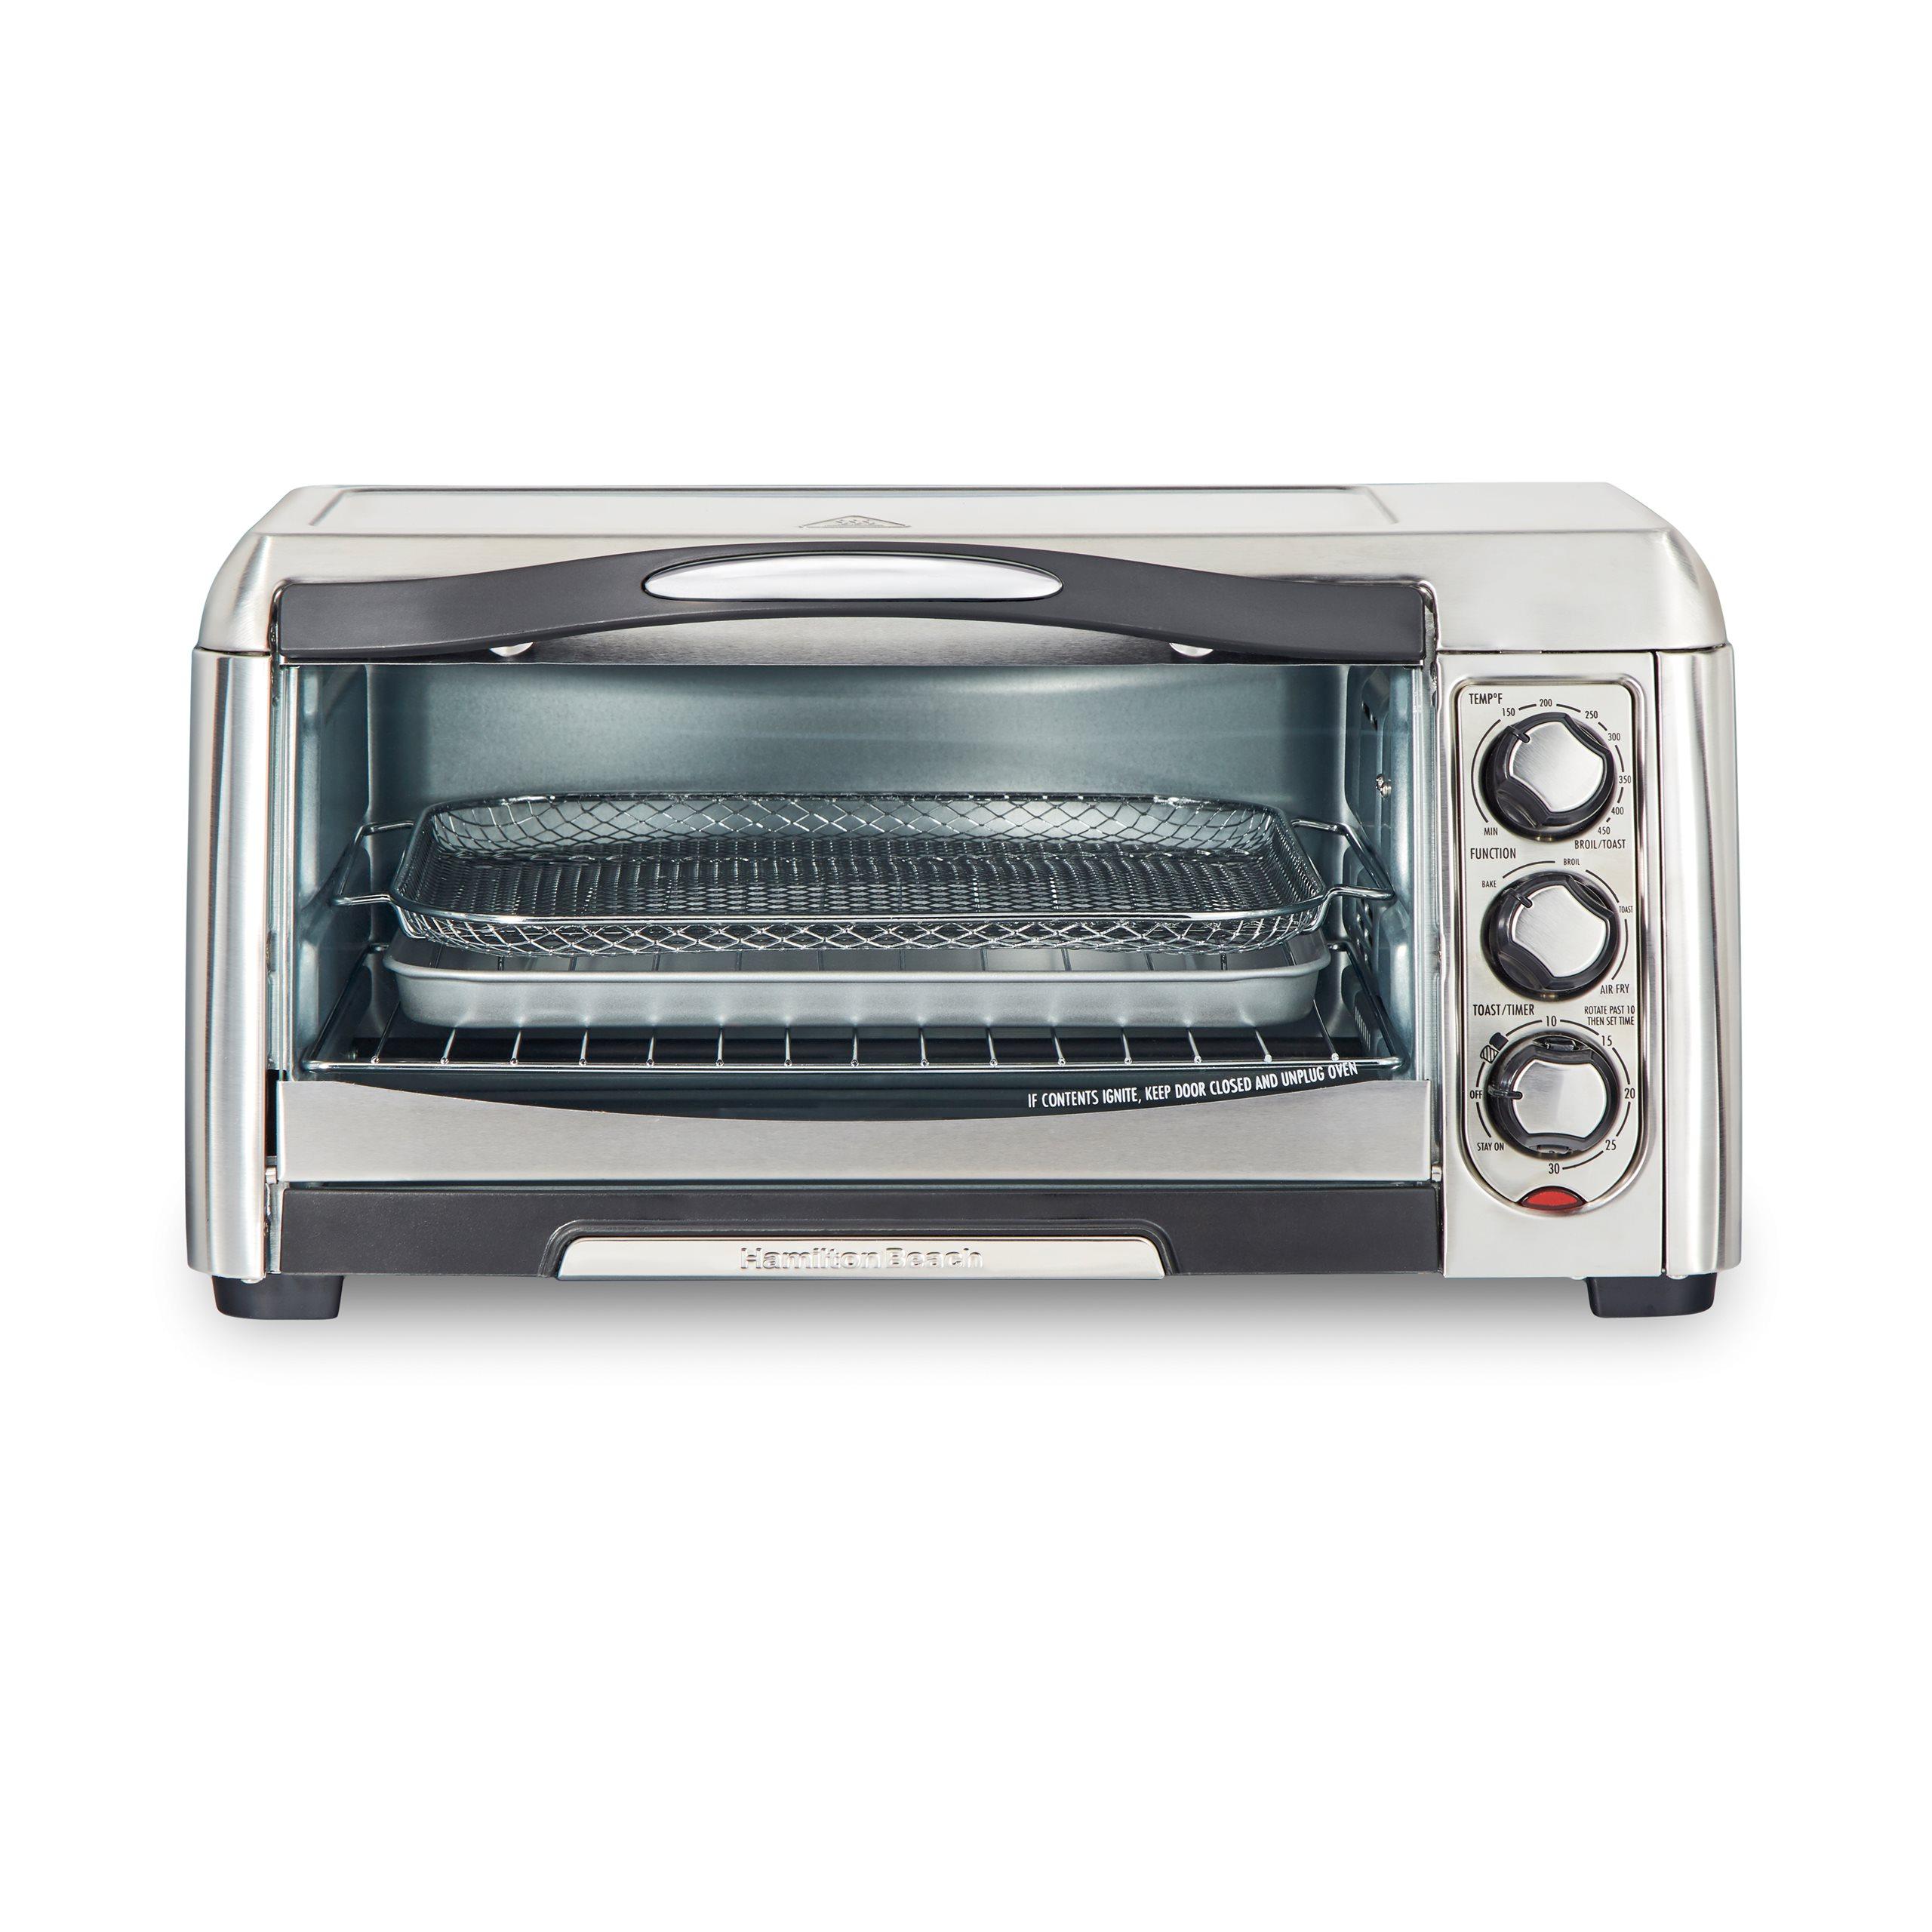 hamilton beach sure crisp air fry toaster oven stainless steel 31323